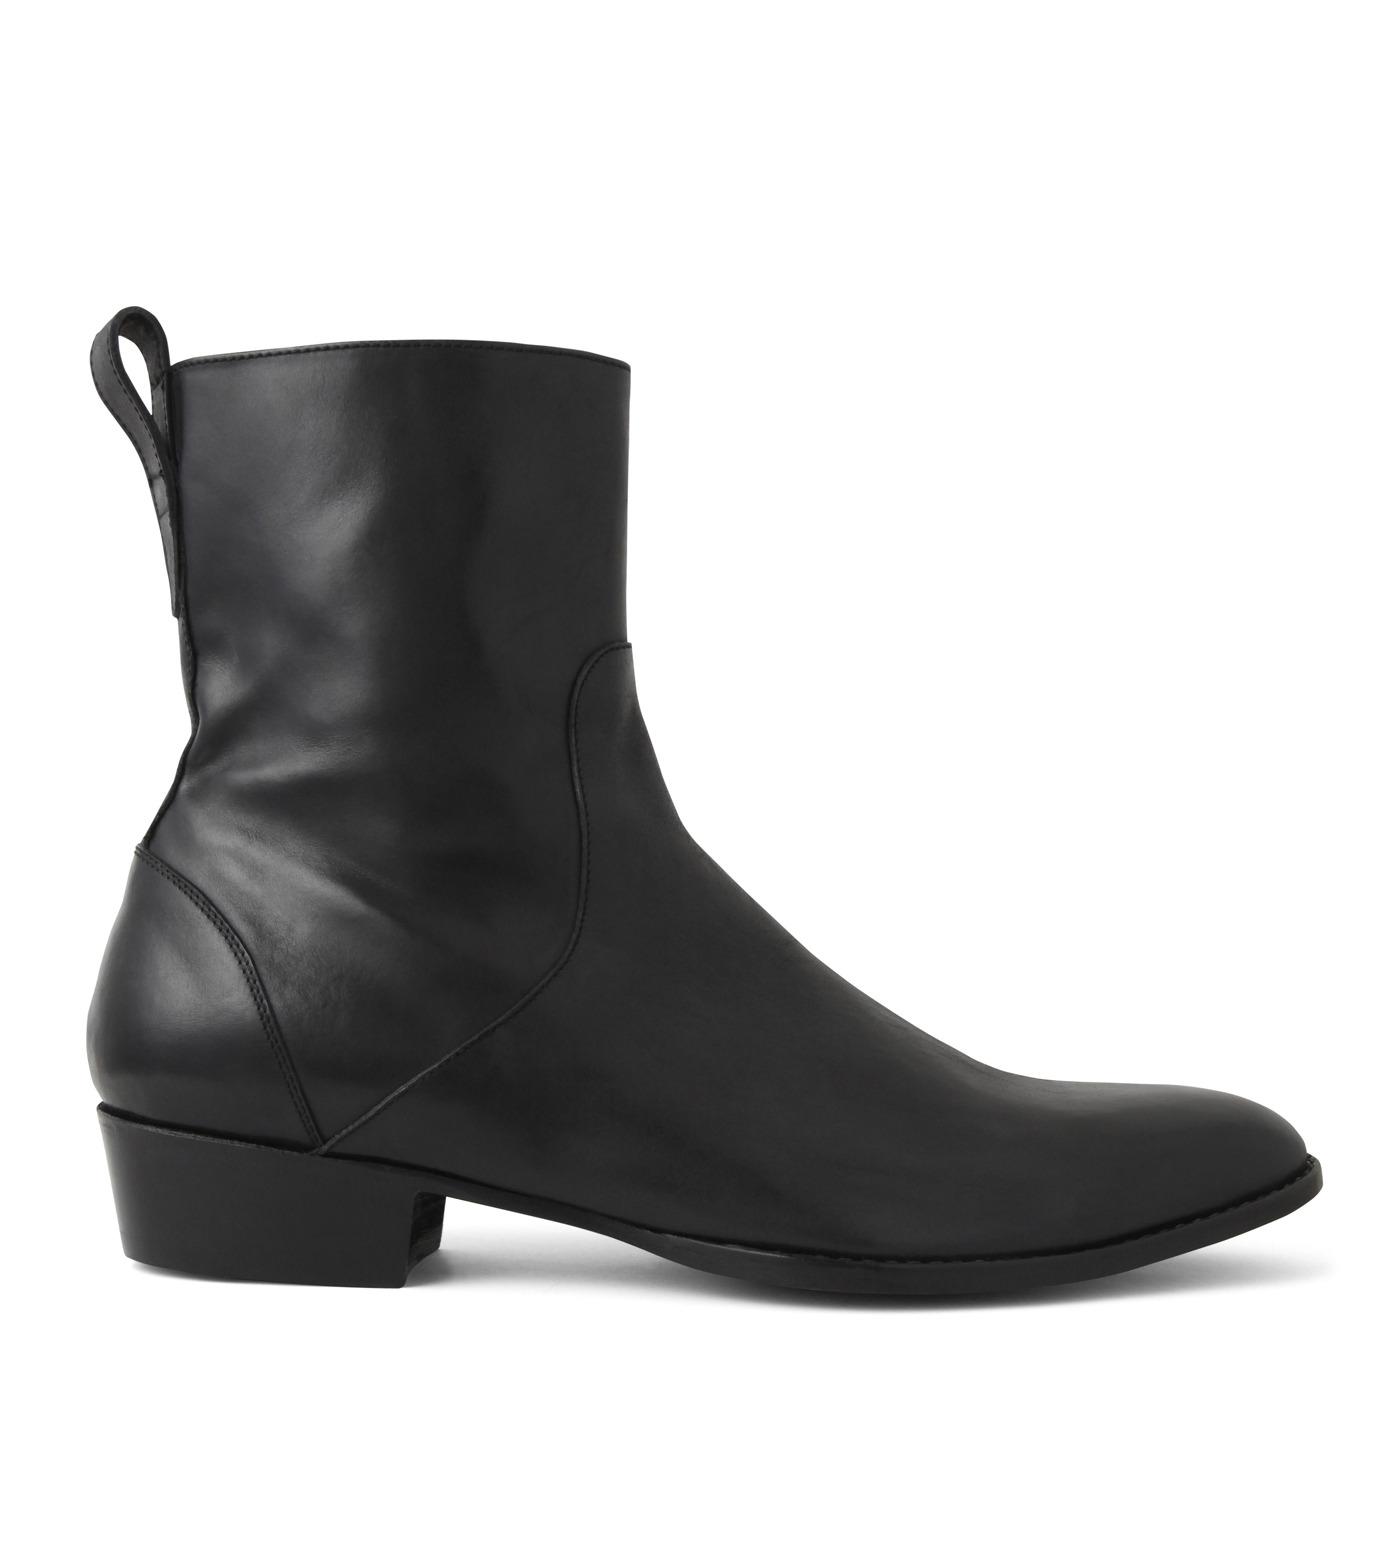 HL HEDDIE LOVU(エイチエル・エディールーヴ)のSIDE ZIP BOOTS-BLACK(シューズ/shoes)-18S90002-13 拡大詳細画像1